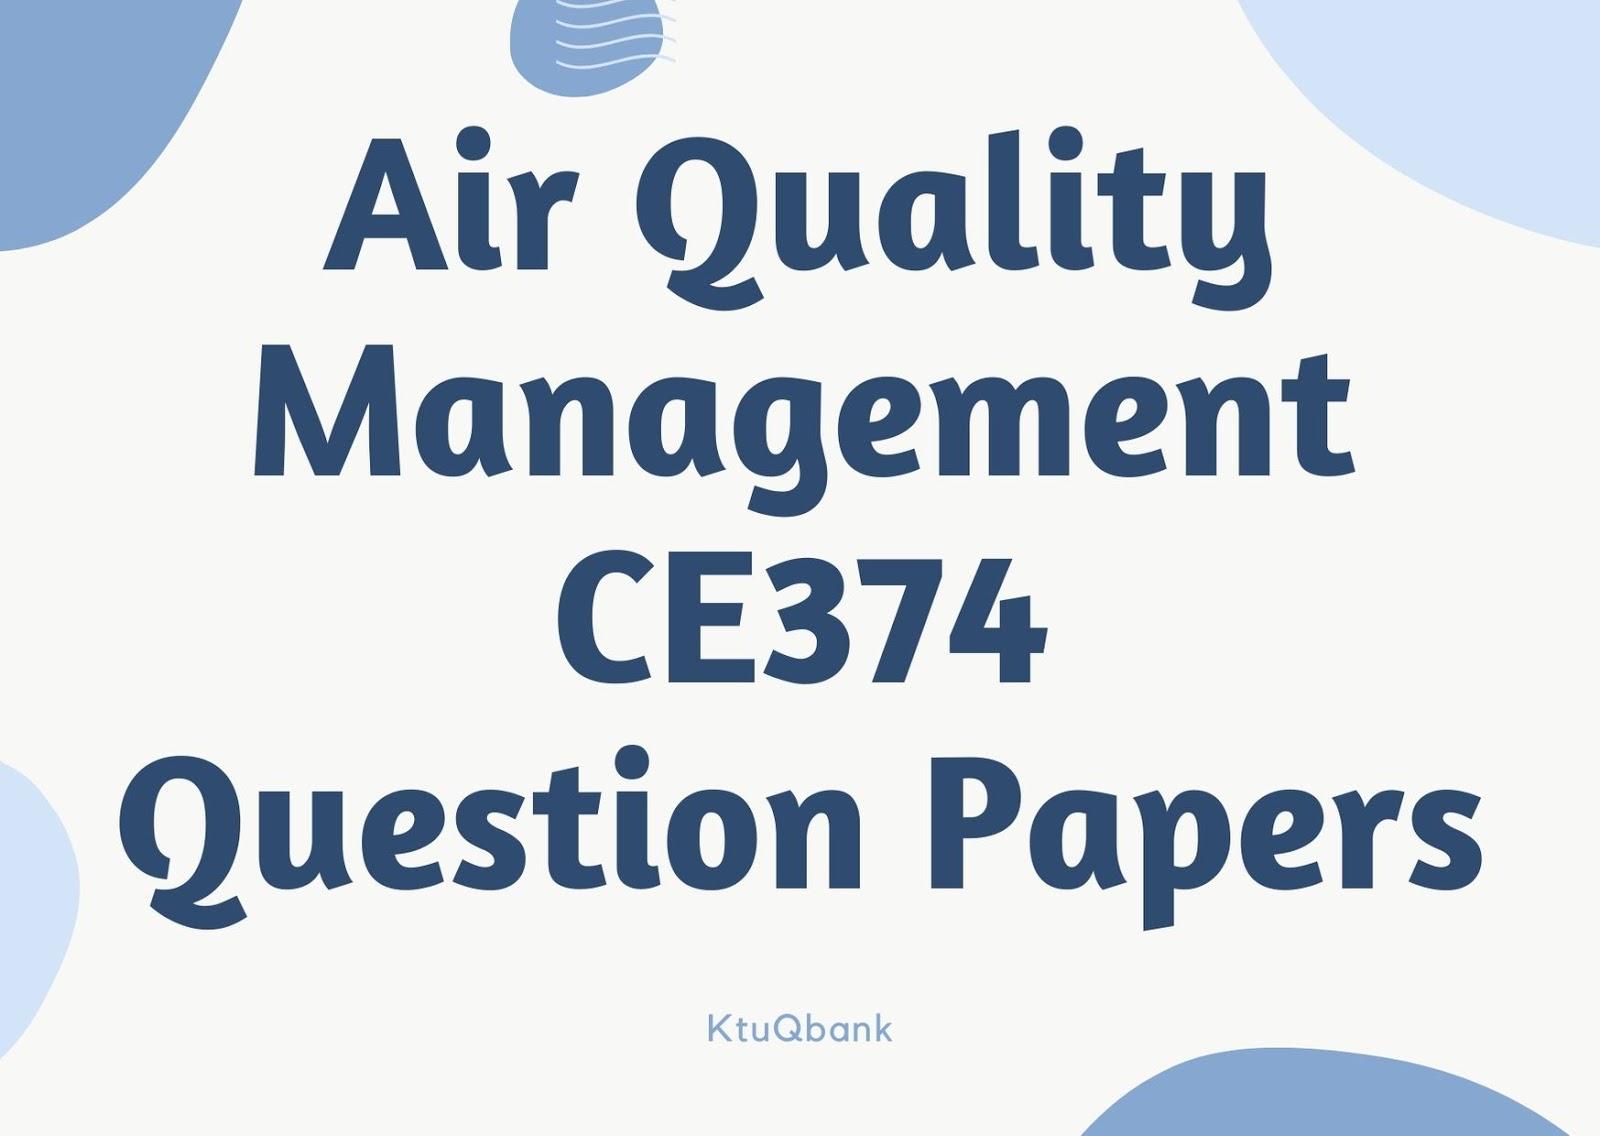 Air Quality Management | CE374 | Question Papers (2015 batch)